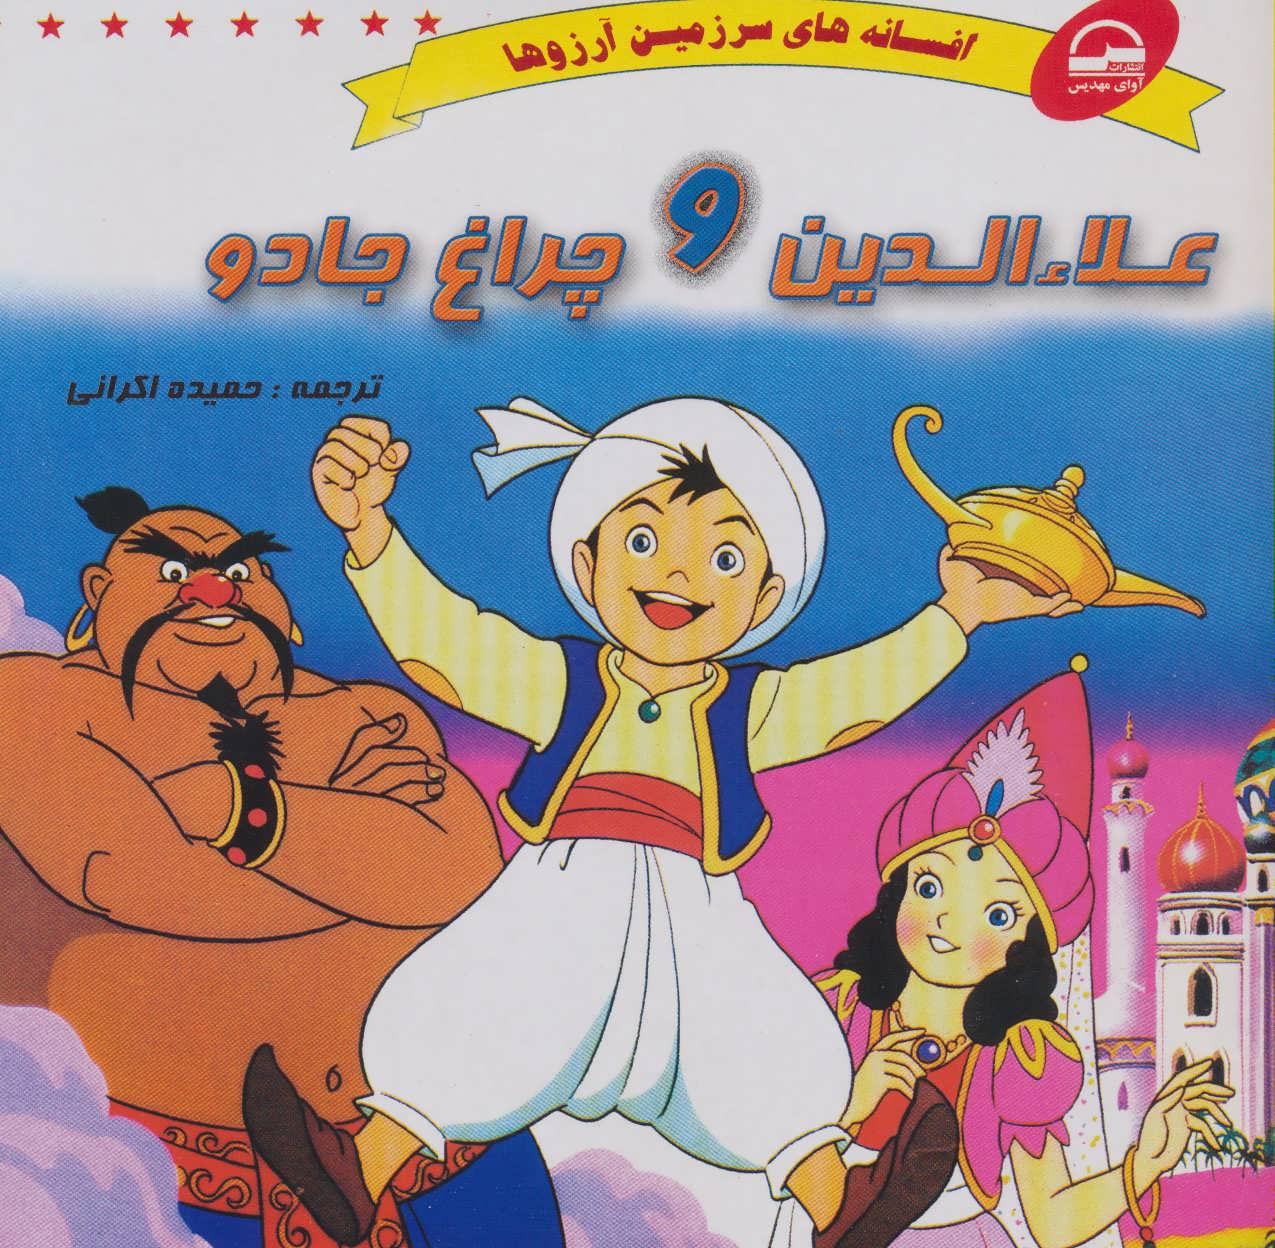 کتاب علاء الدین و چراغ جادو